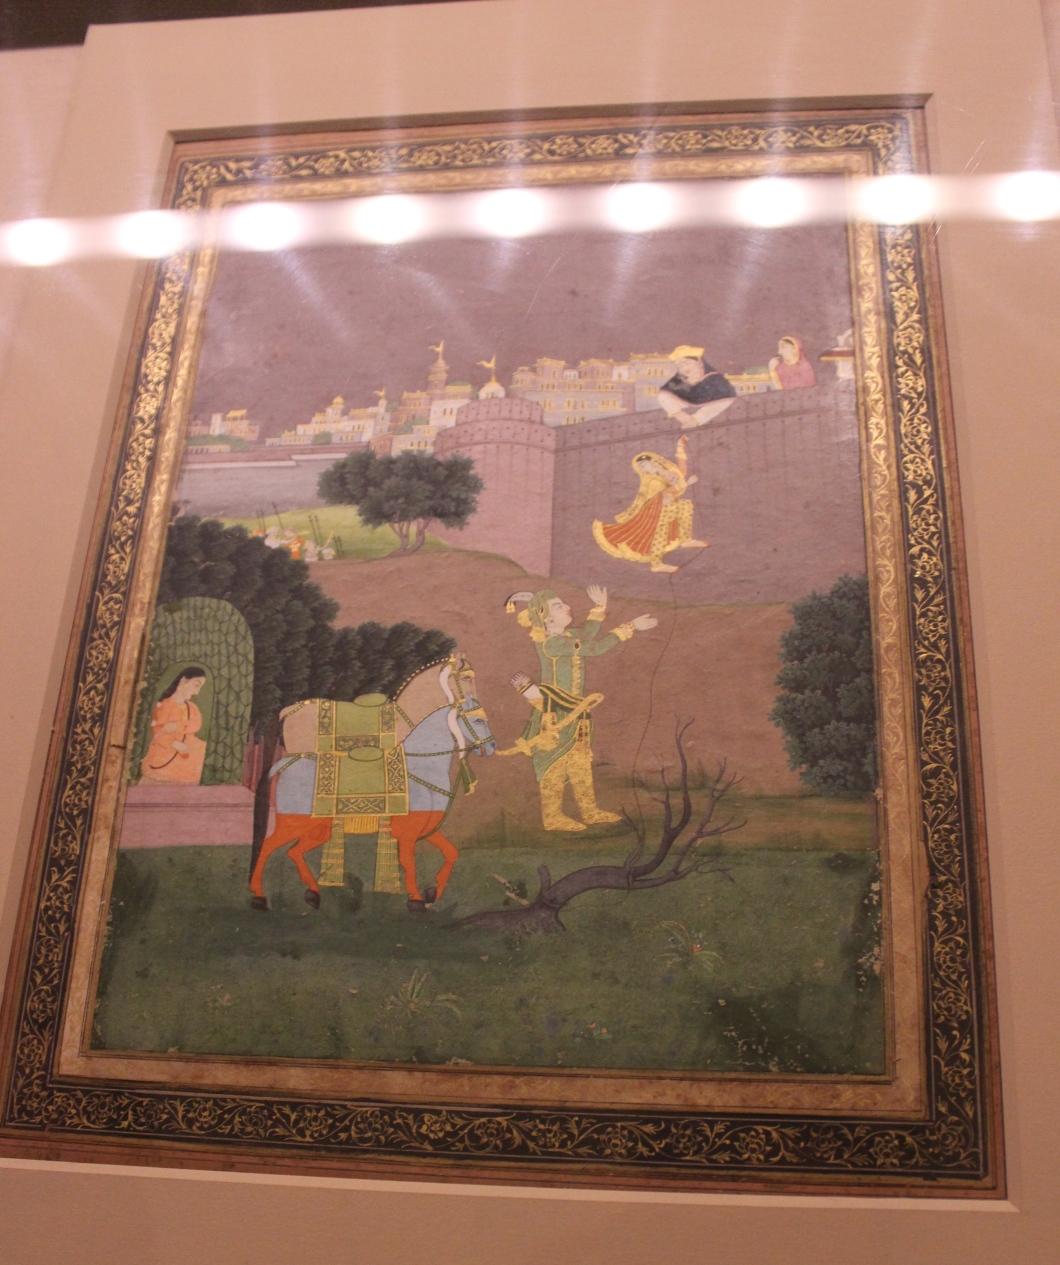 The escape of Rani Rupmati with Bajbahadur: Rajasthani, Jaipur, 19th century CE (Indian Miniature Painting - Photograph in mirandavoice.com)